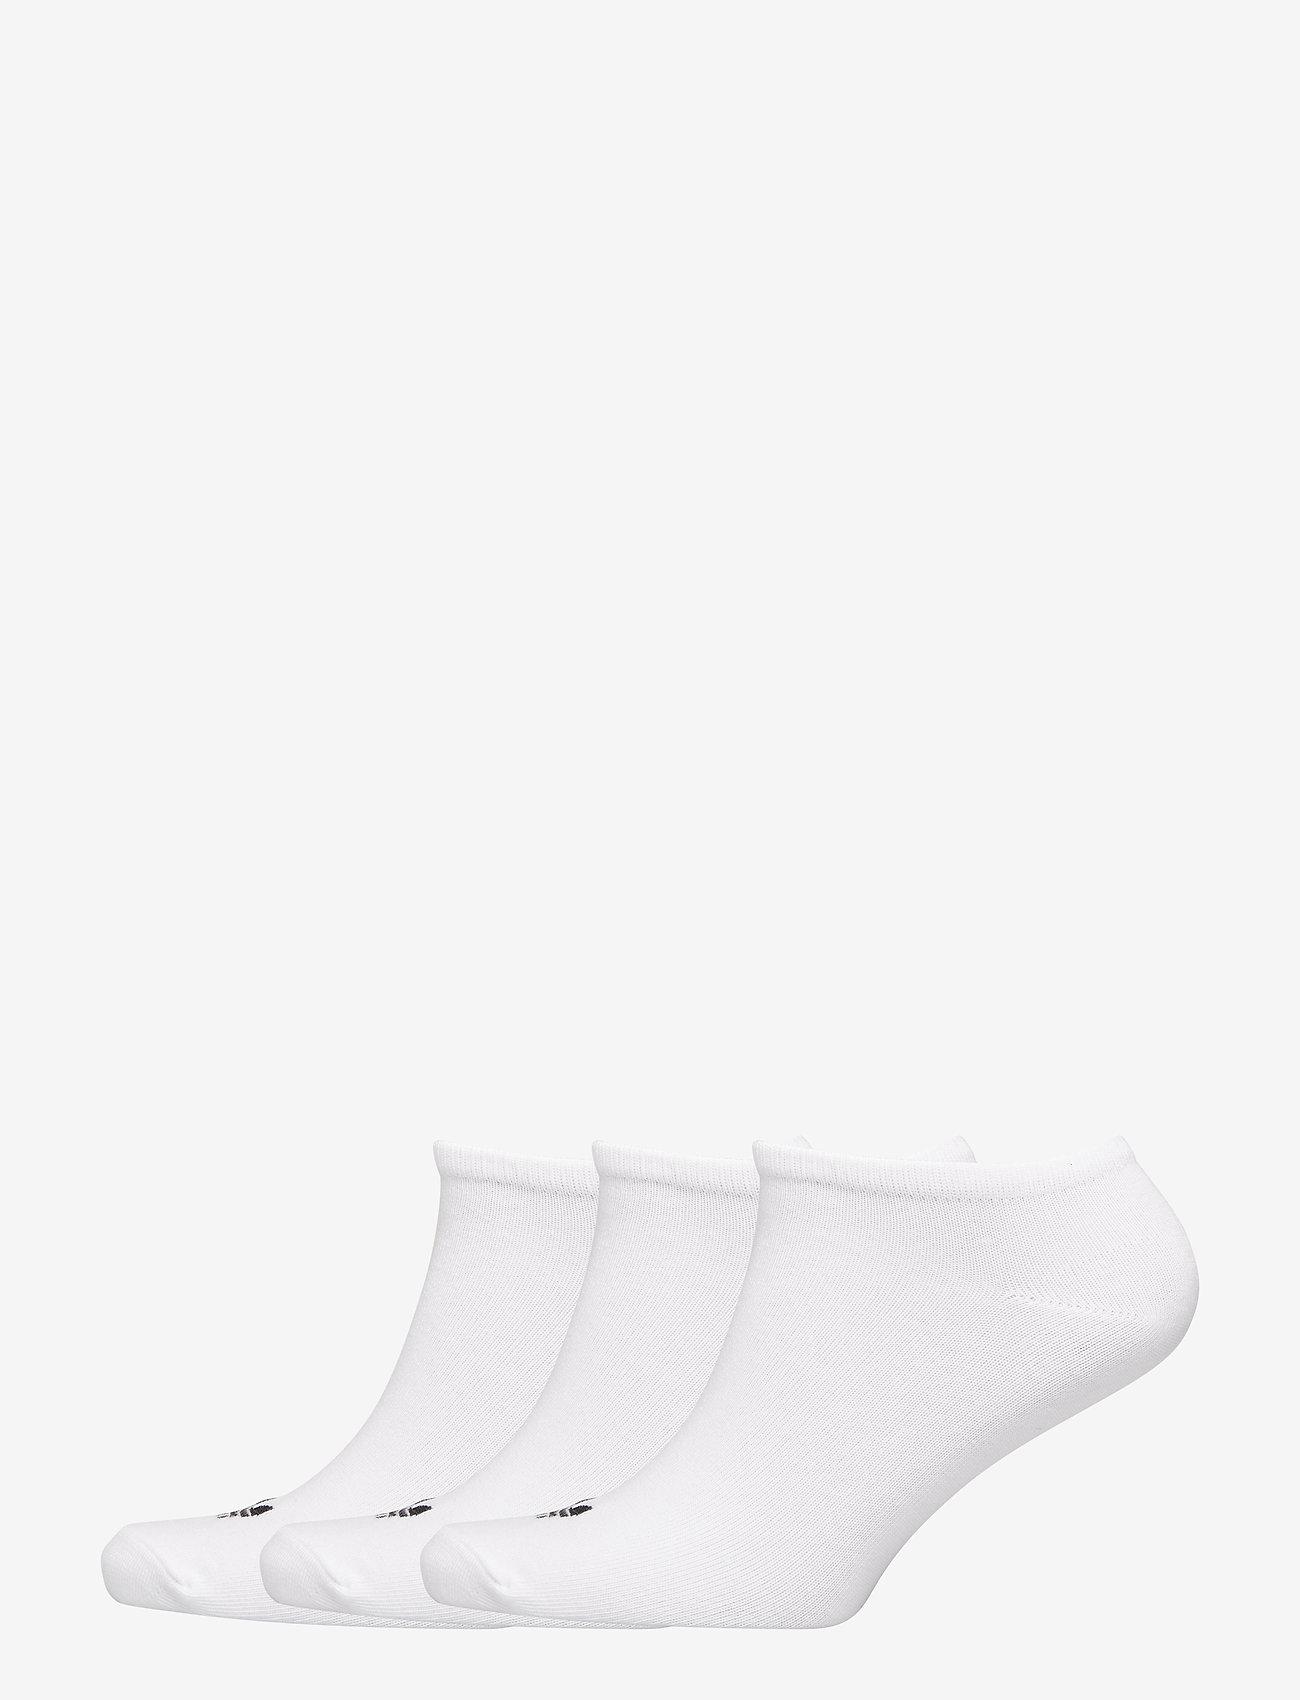 adidas Originals - TREFOIL LINER - steps & footies - white/white/black - 0